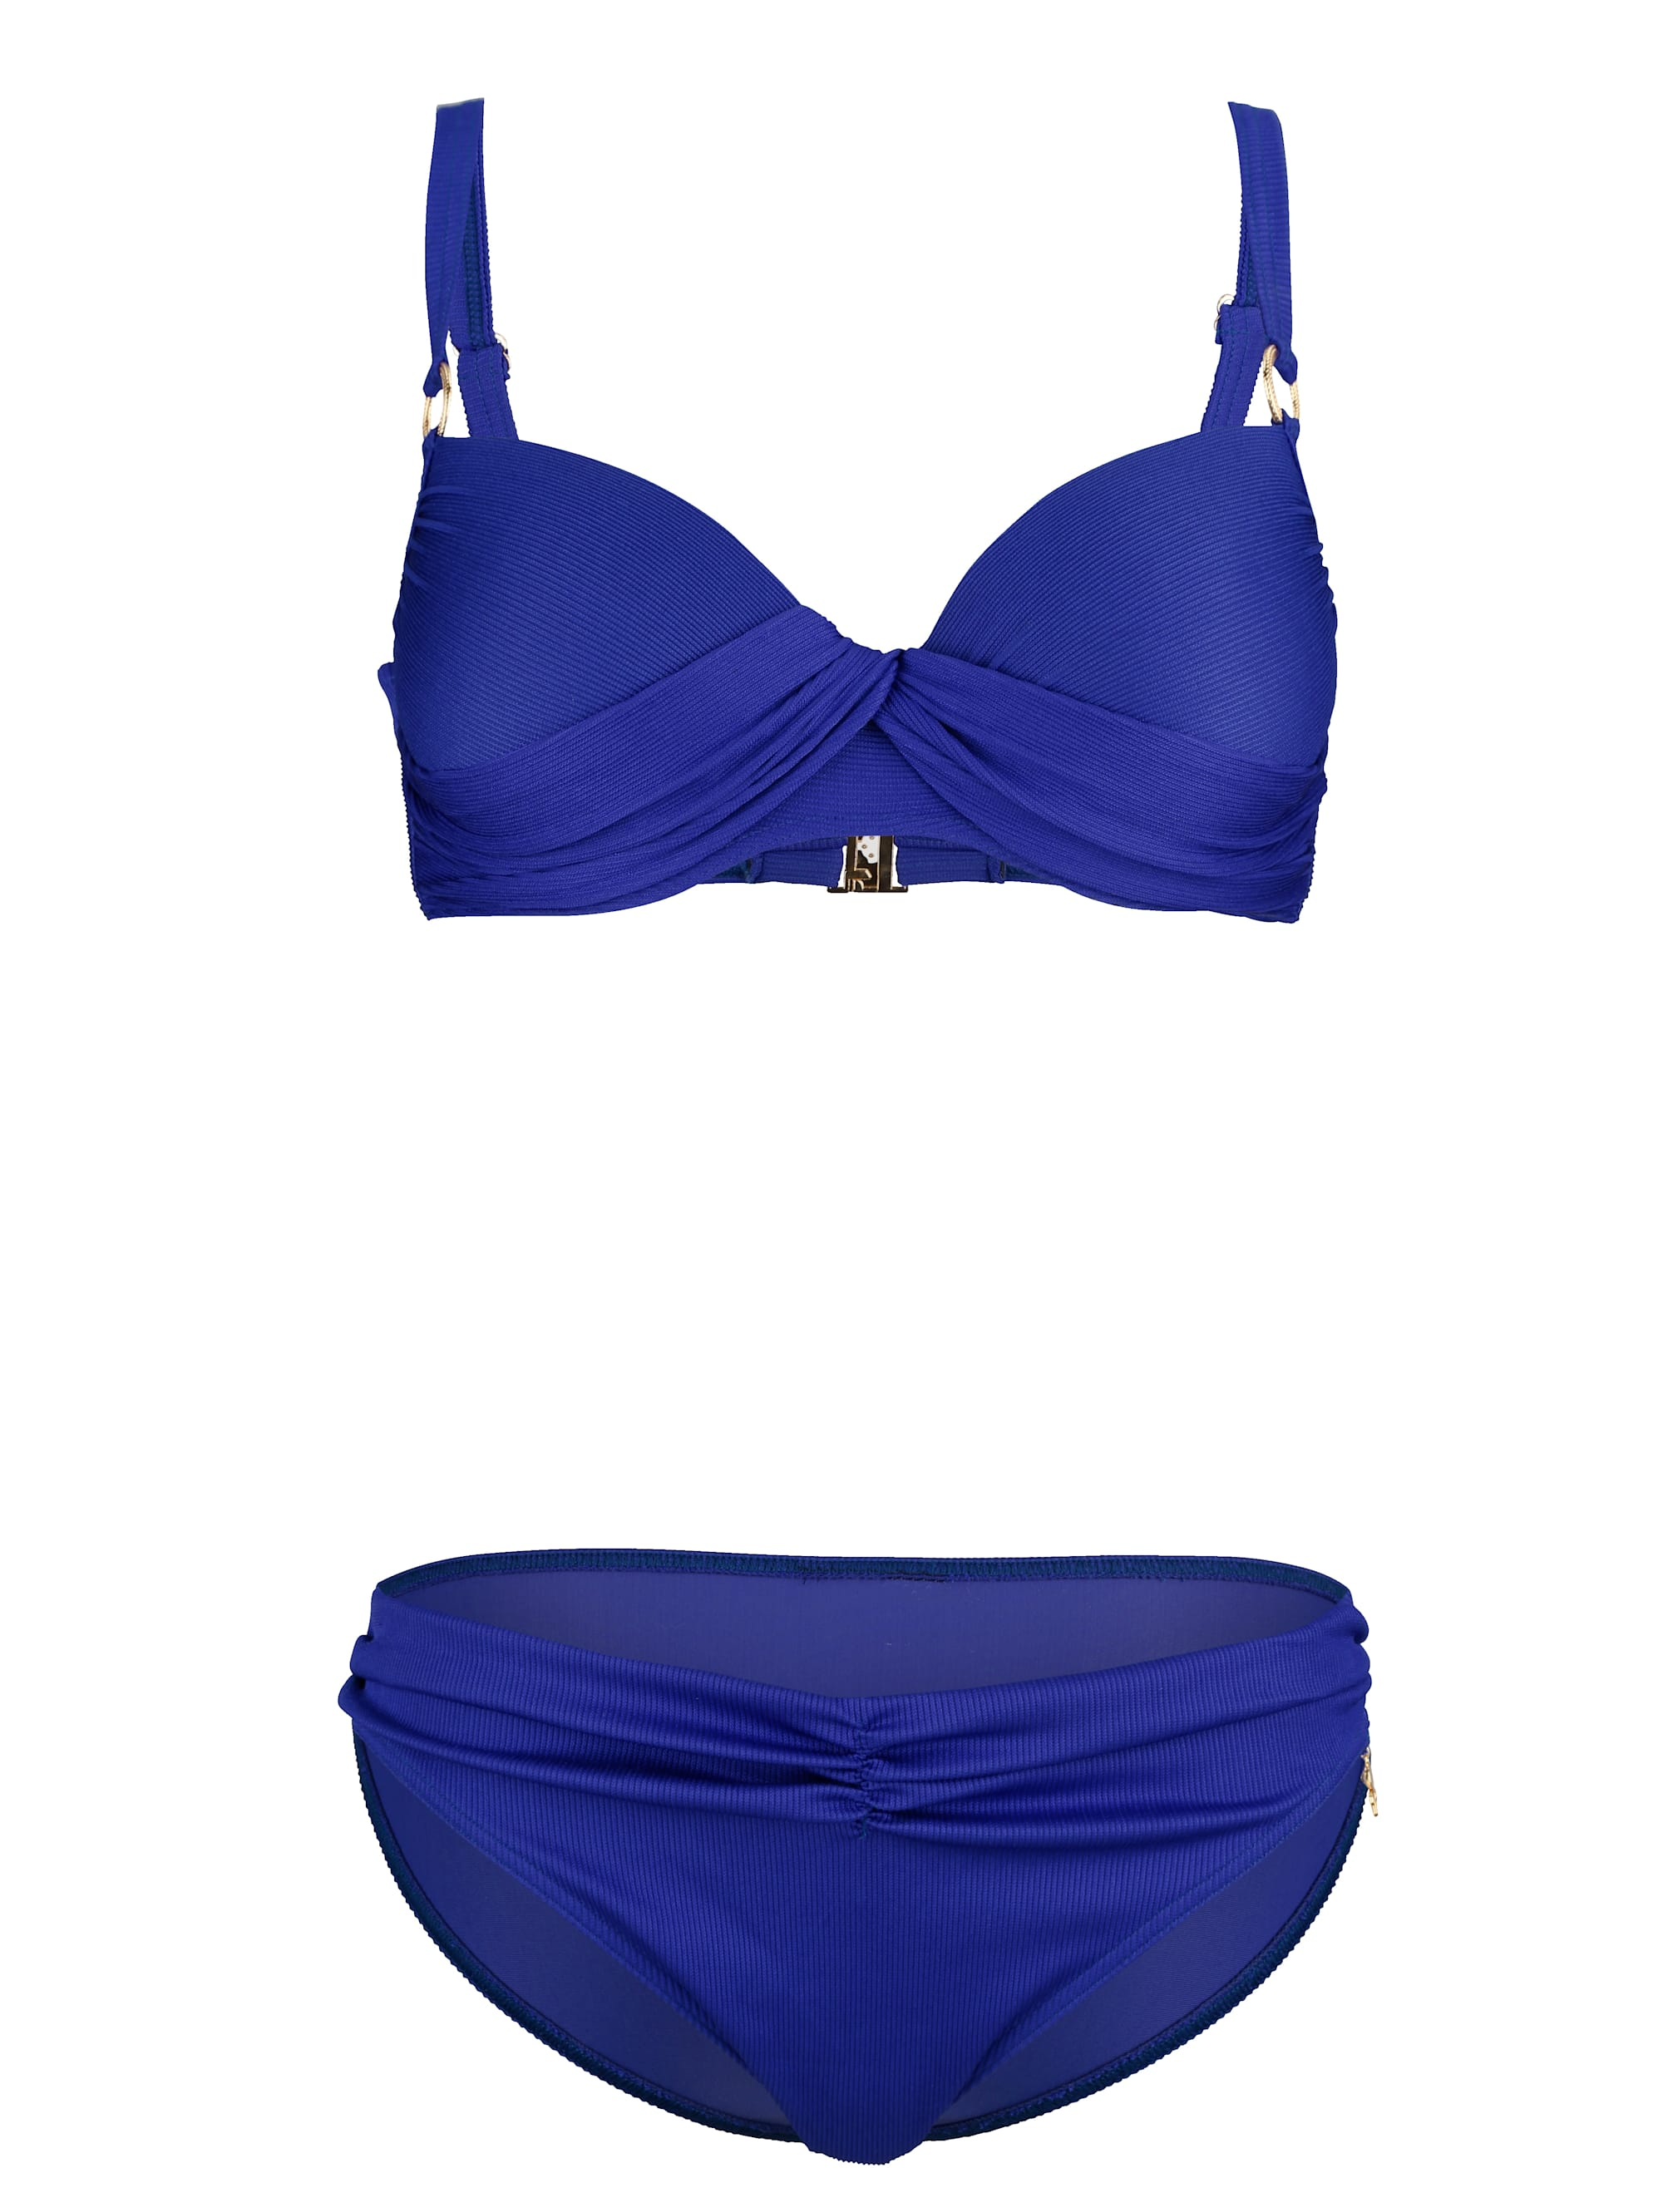 Opera PushUp-Bikini mit Rippmuster 2lmt3 1Zrxq